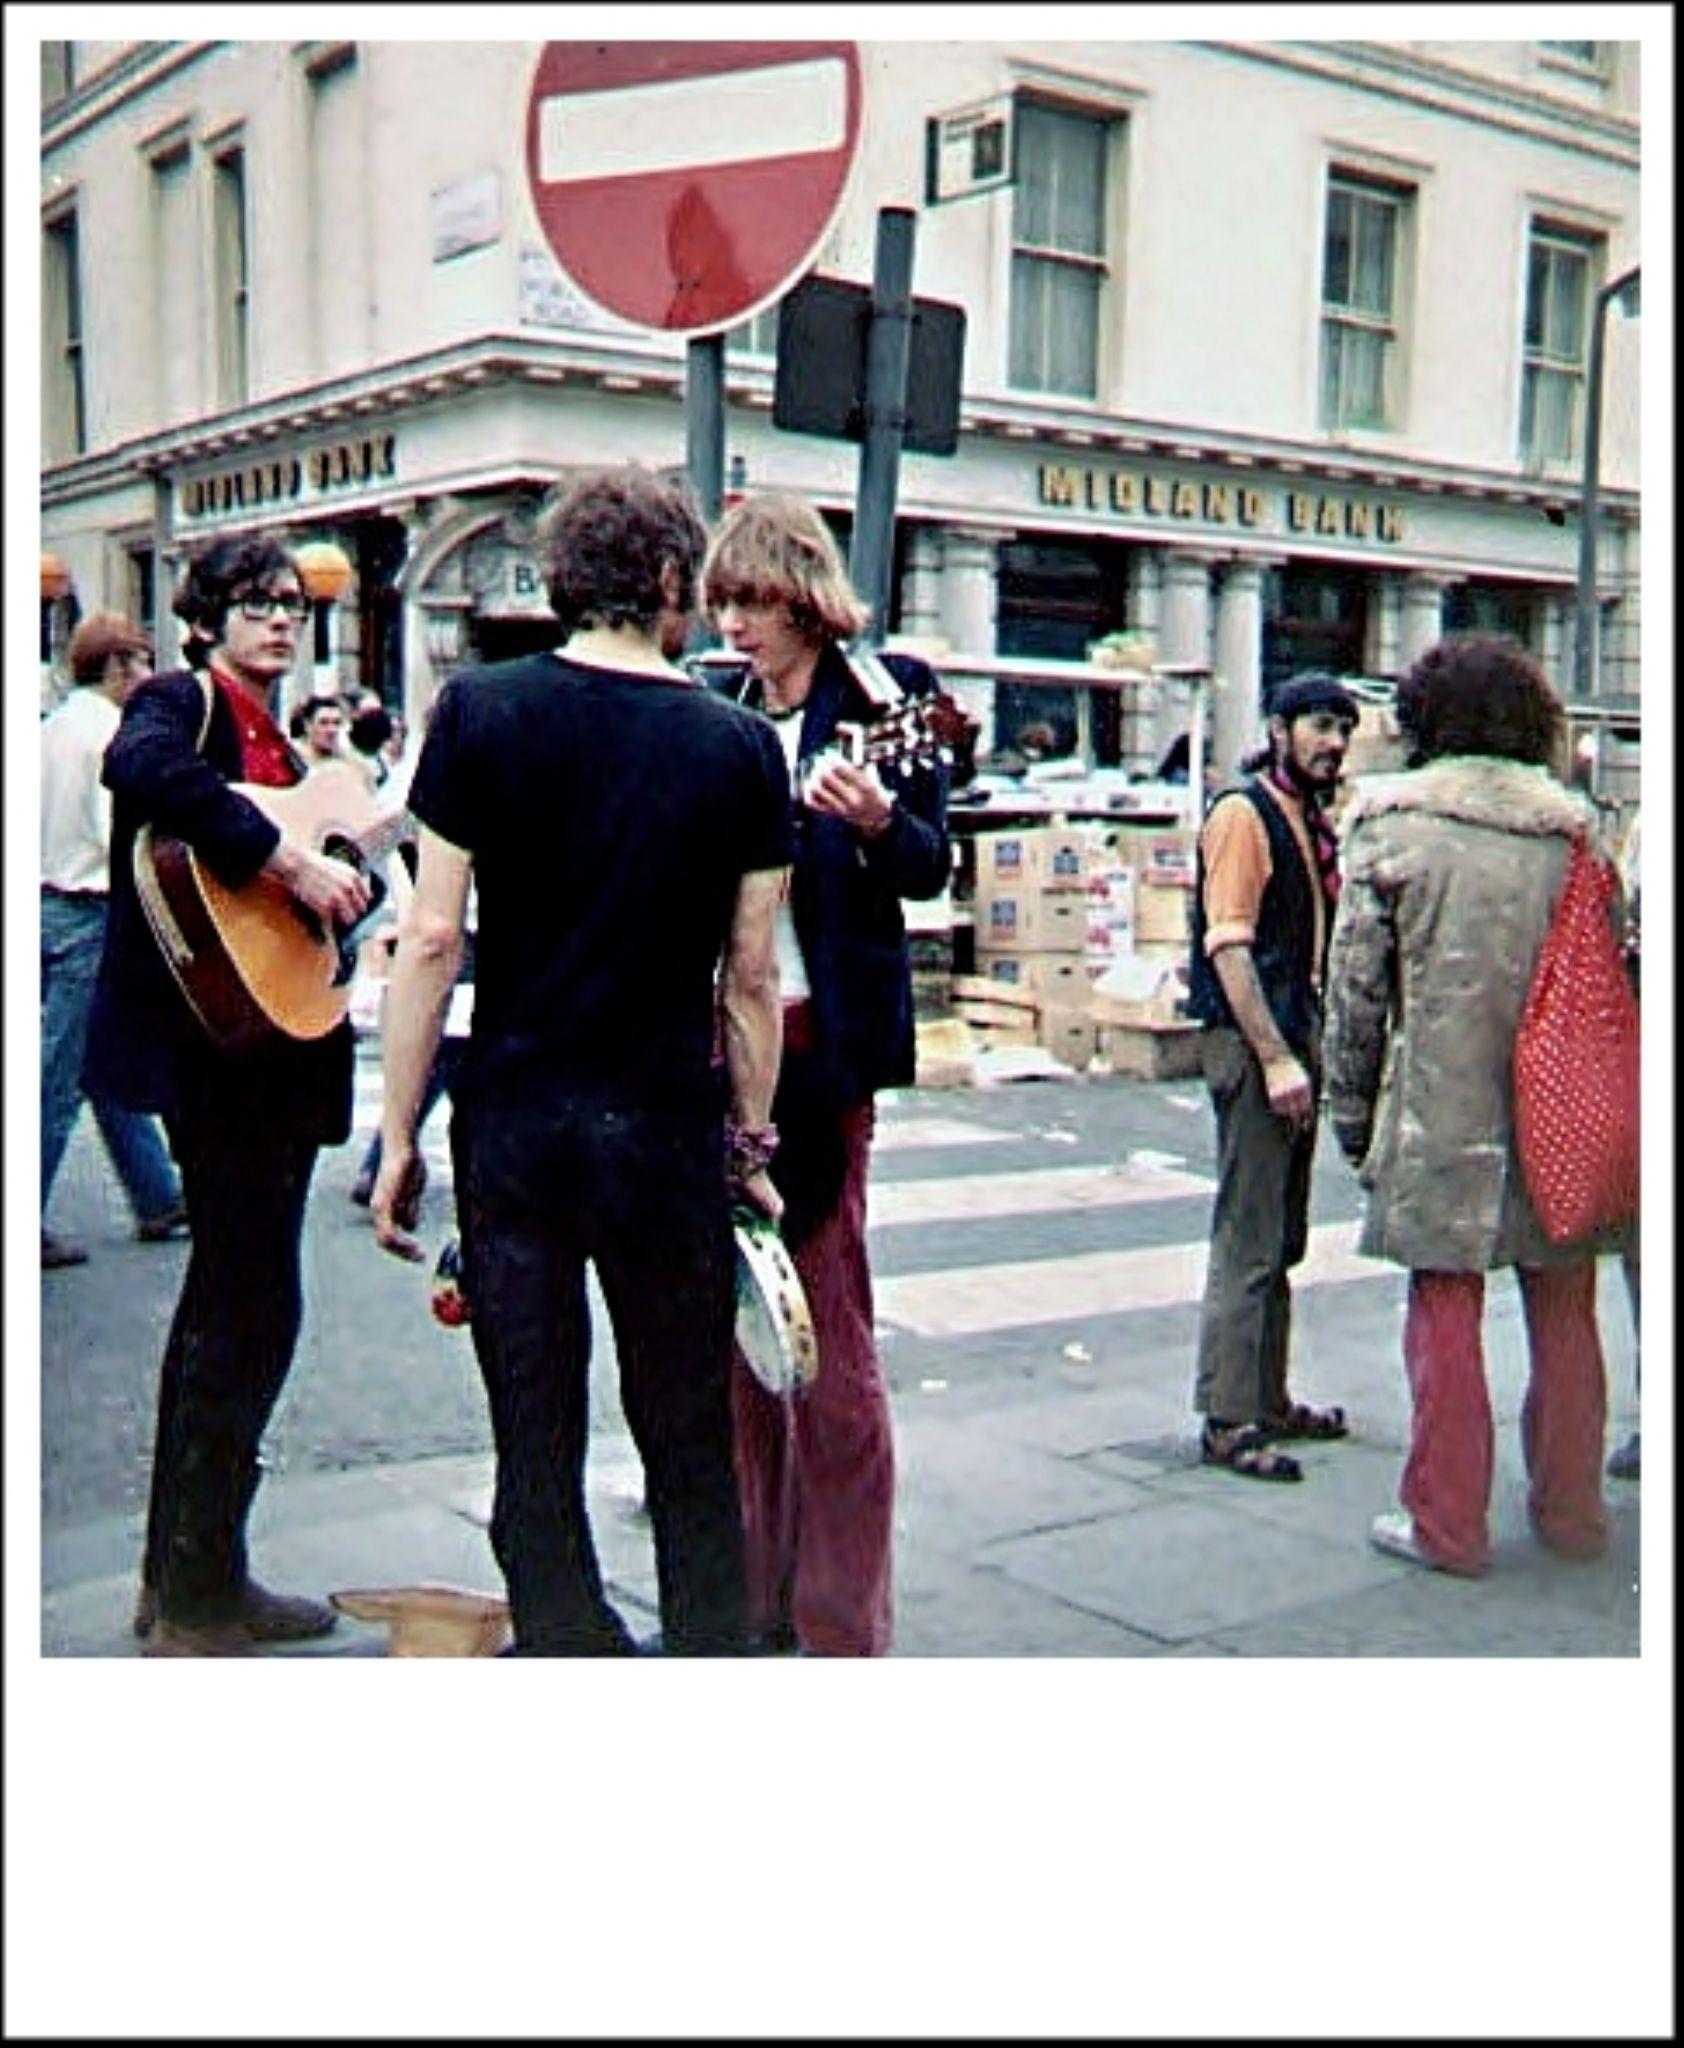 Street music by marilenavaccarini